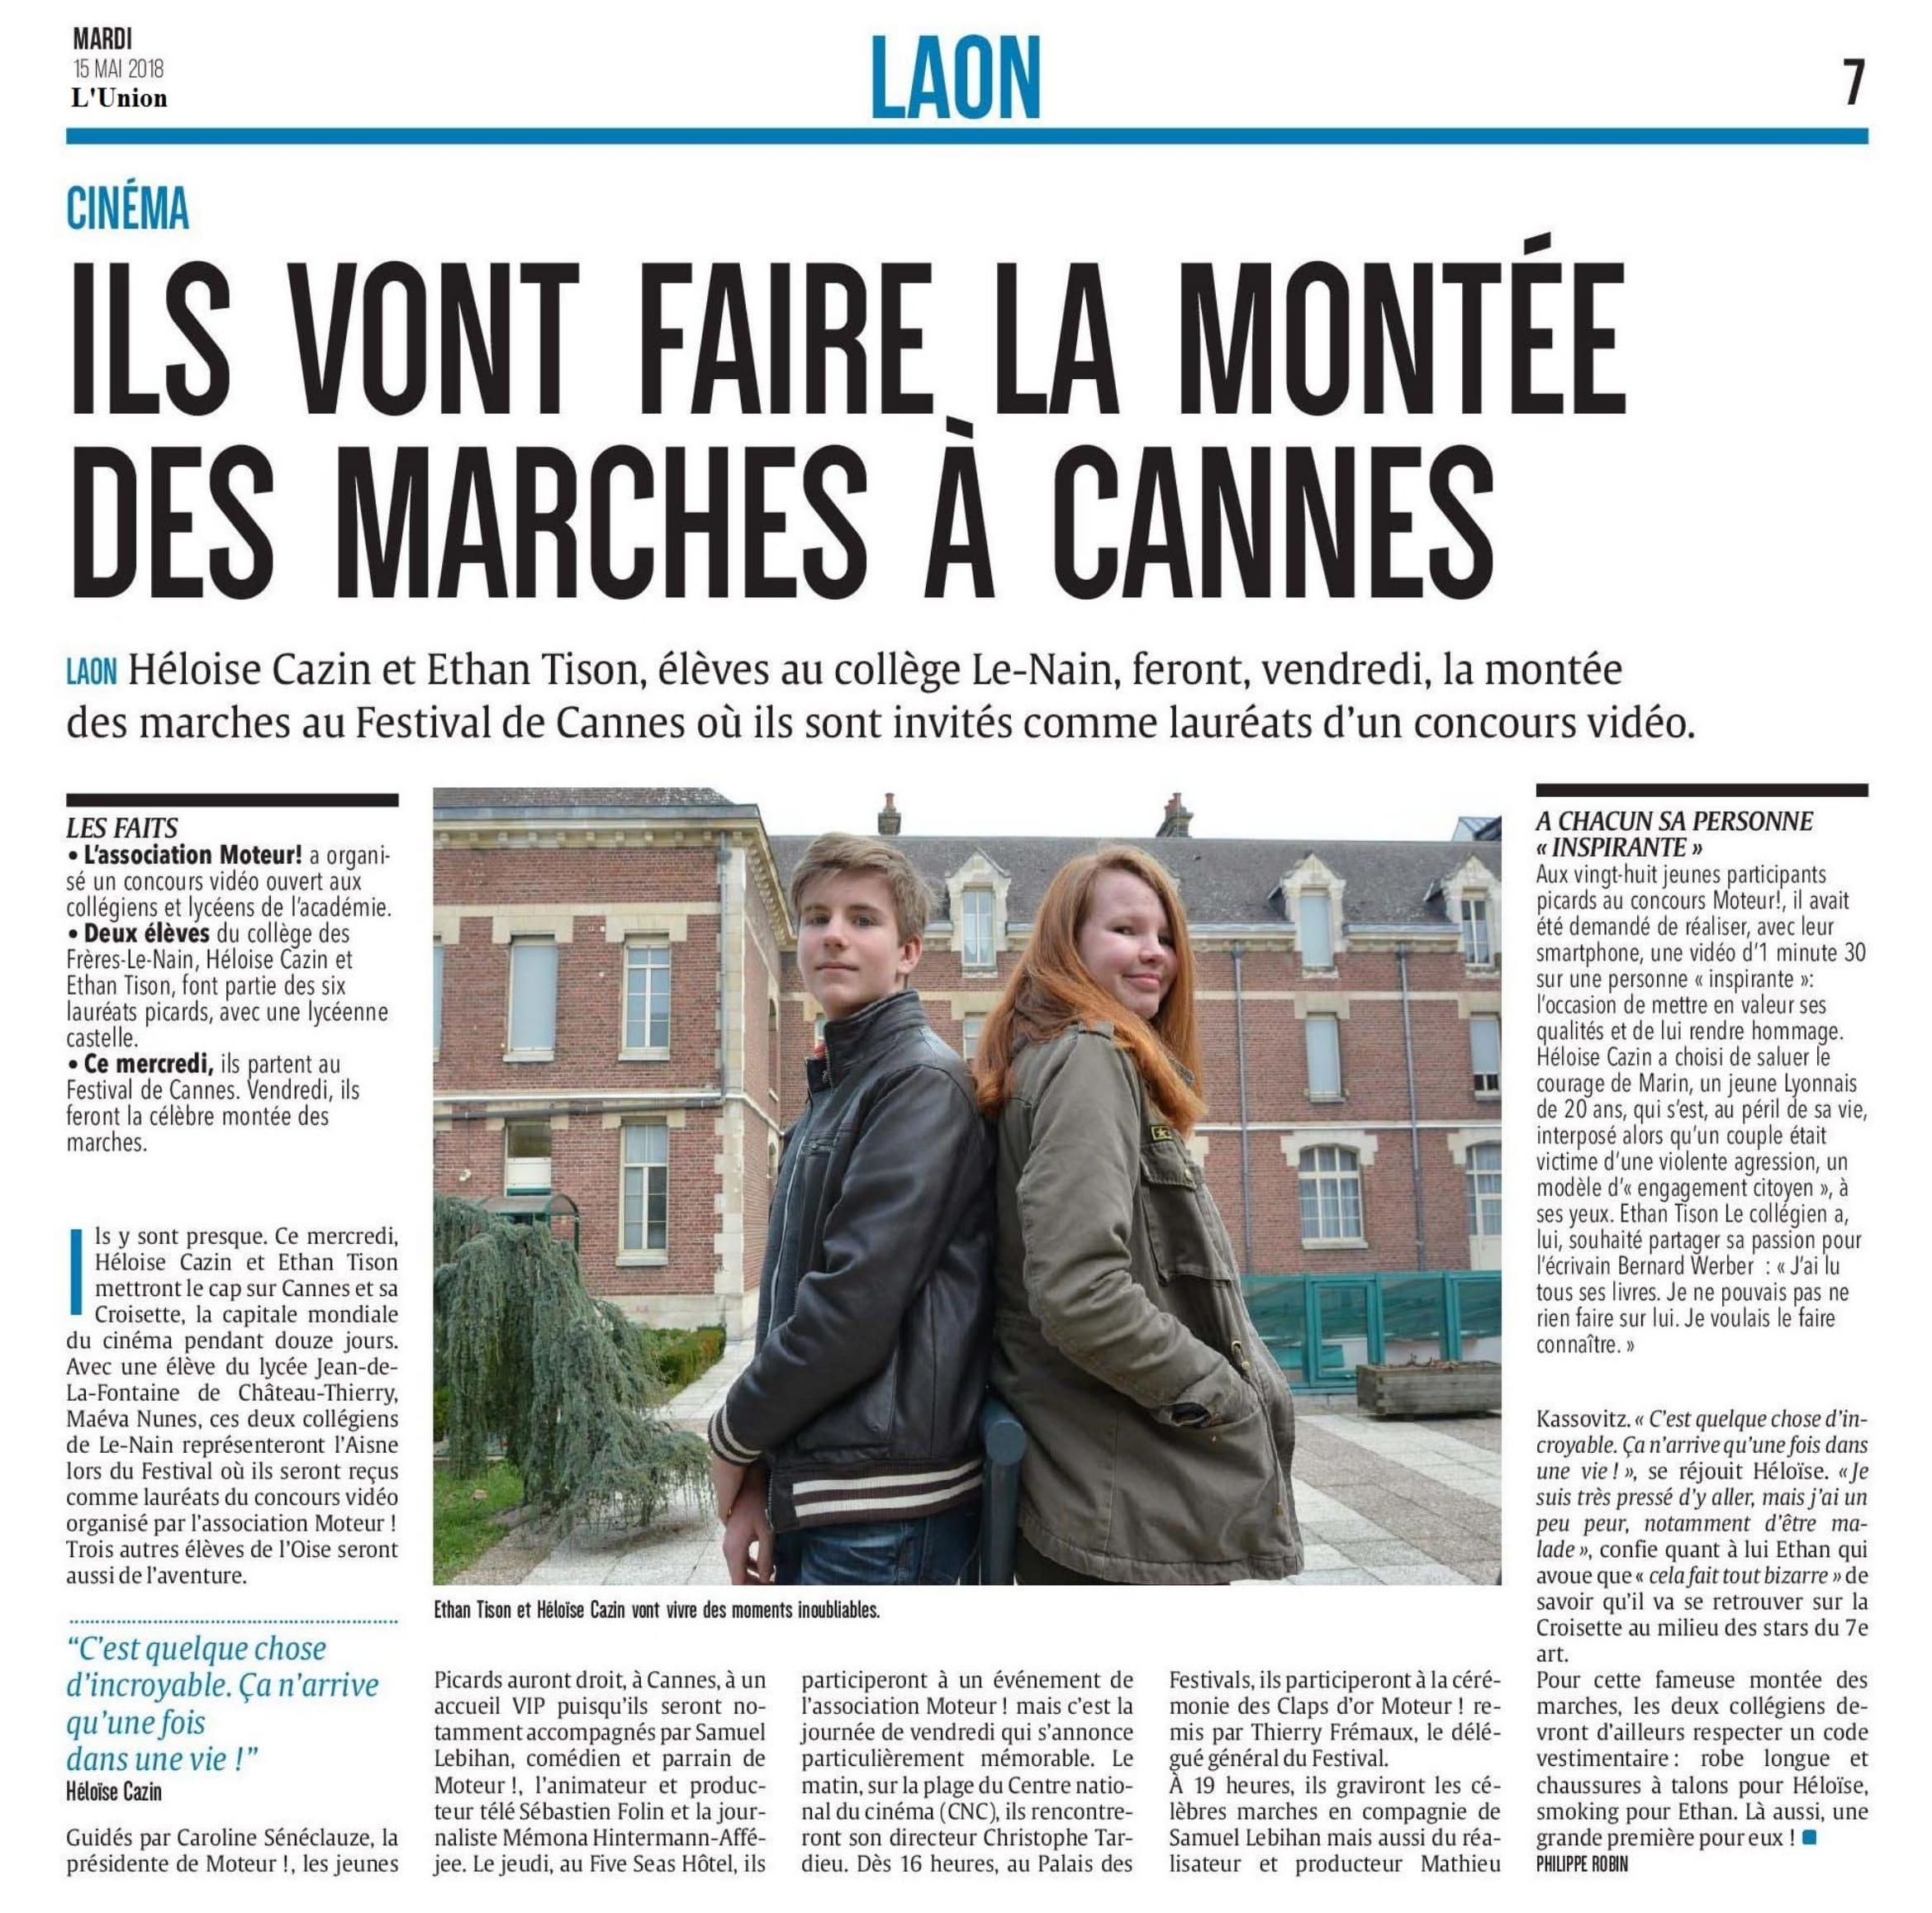 15.05.2018_Laon_Lyc_Concours_Cannes_Union-1.jpg